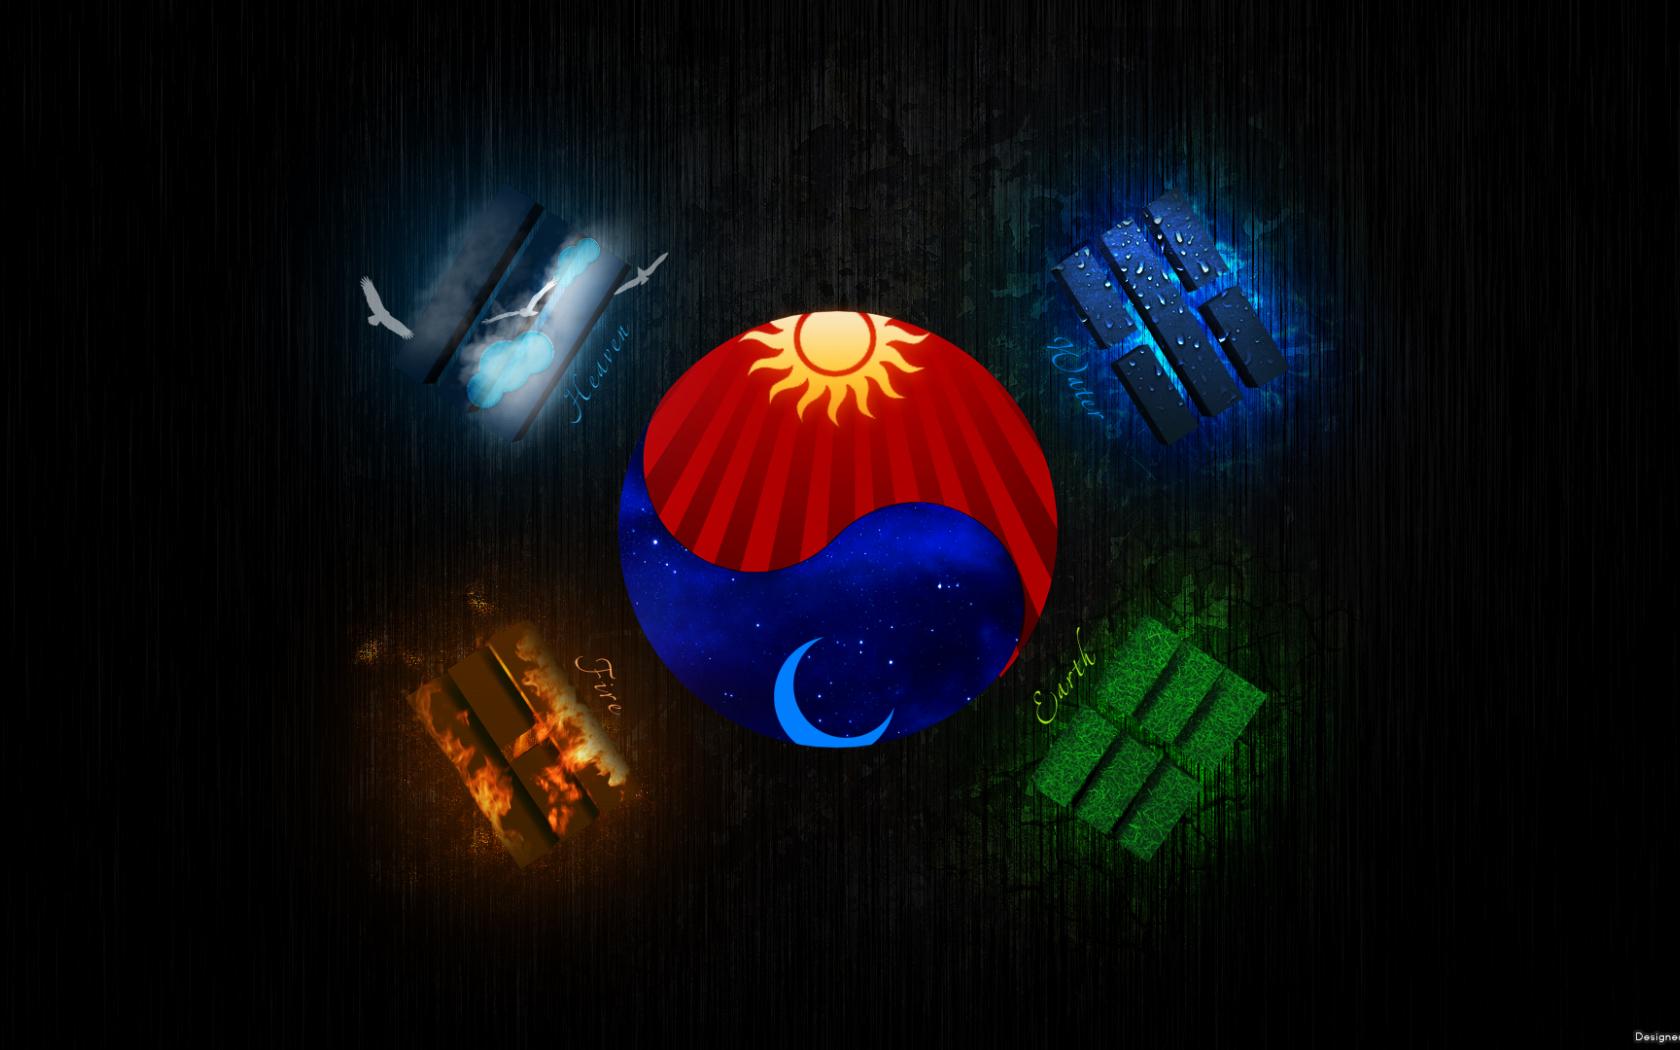 Free Download Korean Flag Wallpaper 1920x1080 For Your Desktop